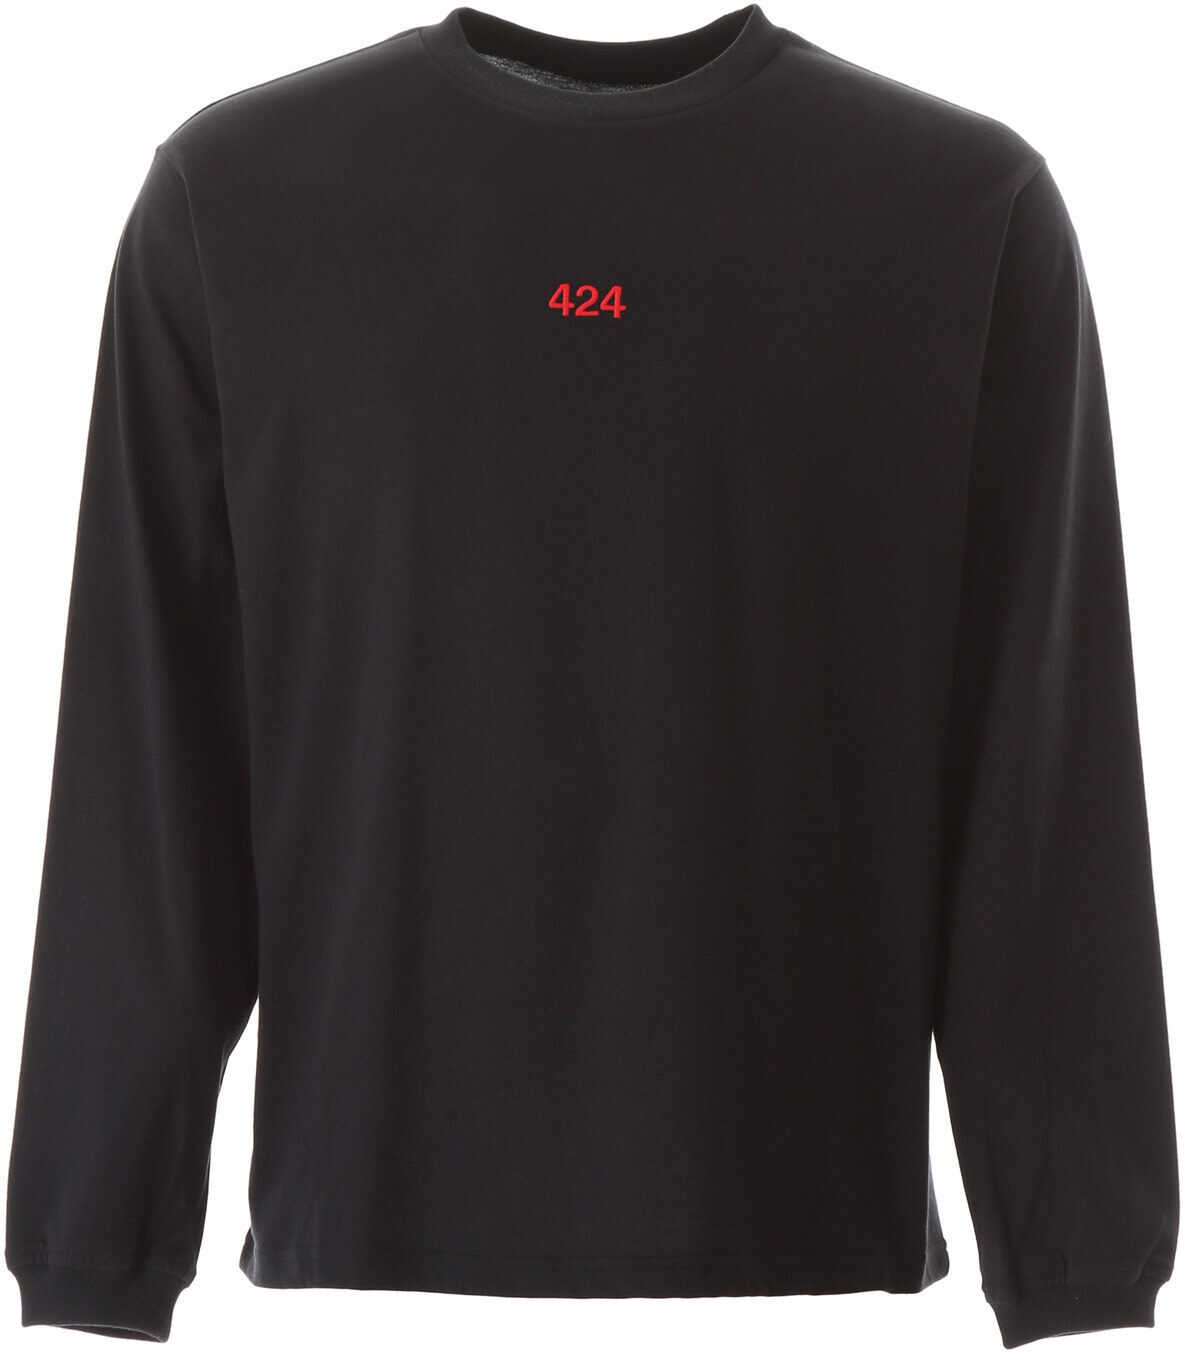 424 Long-Sleeved T-Shirt BLACK